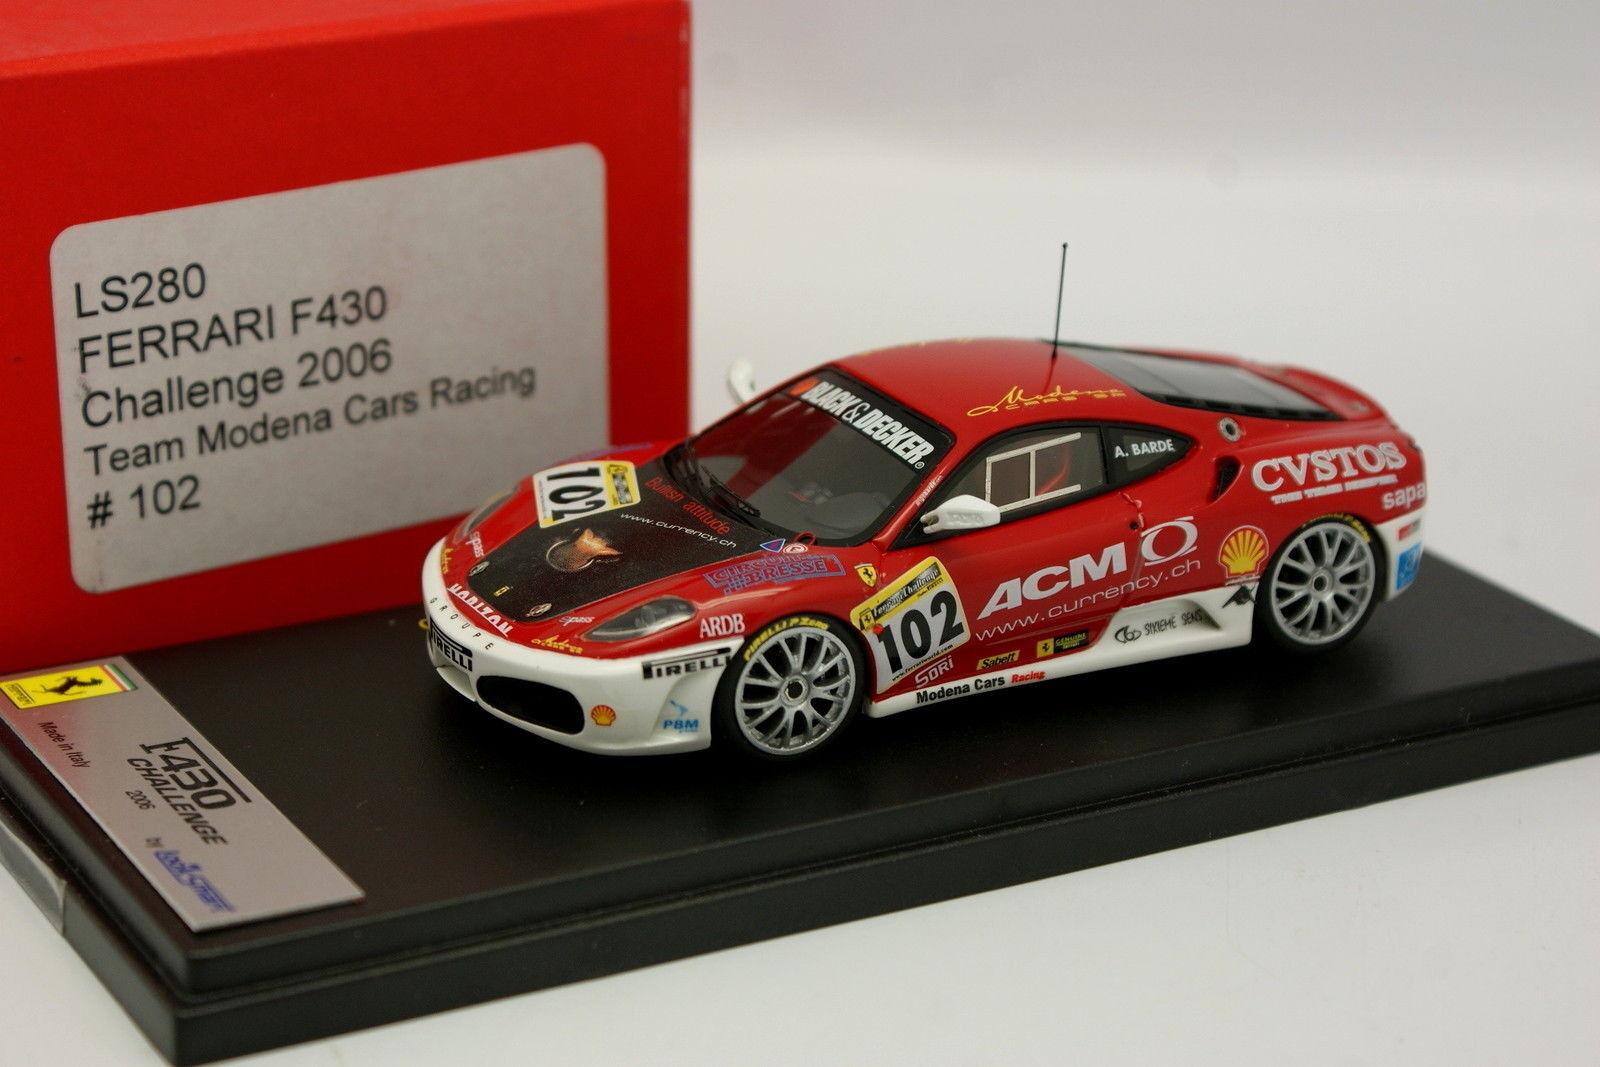 Looksmart 1 43 - Ferrari F430 Challenge 2006 Team Modena Cars Racing N°102